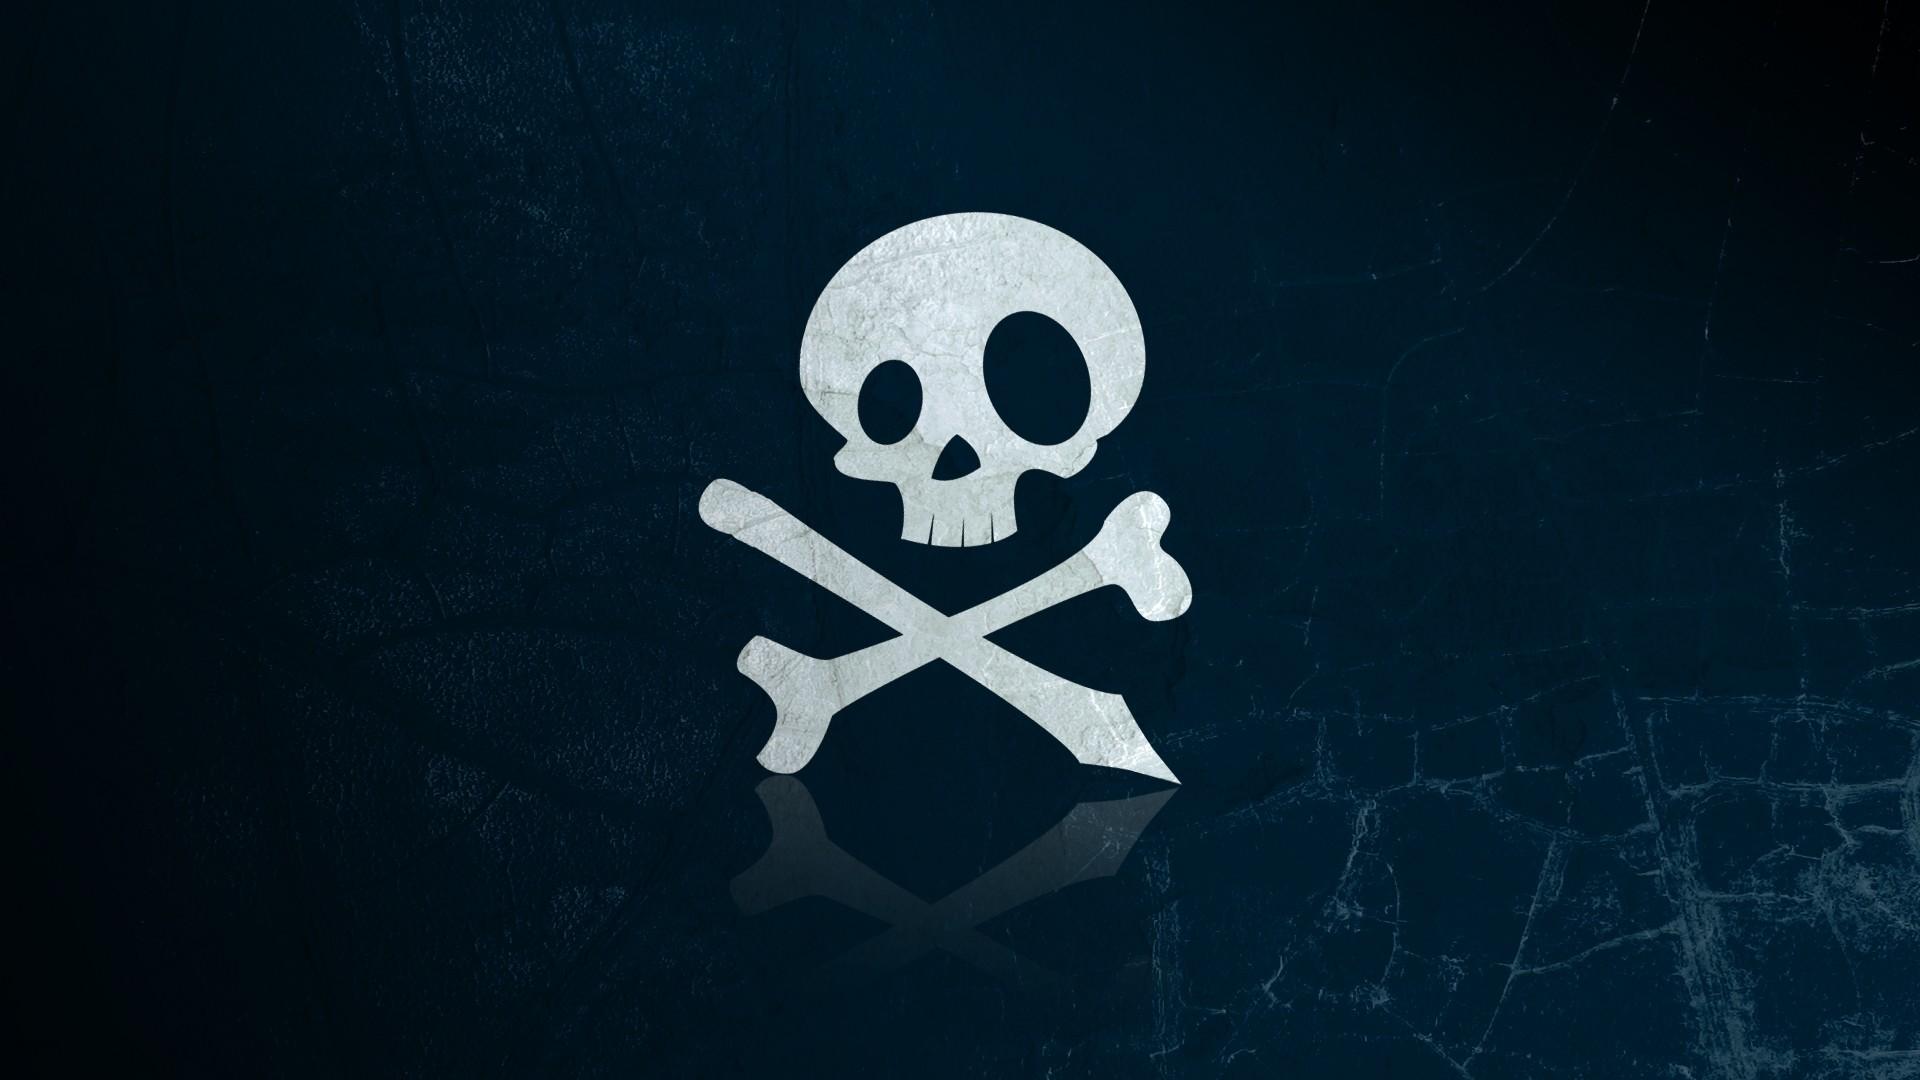 Skull And Bones Wallpaper: Skull And Crossbones Wallpaper (48+ Images